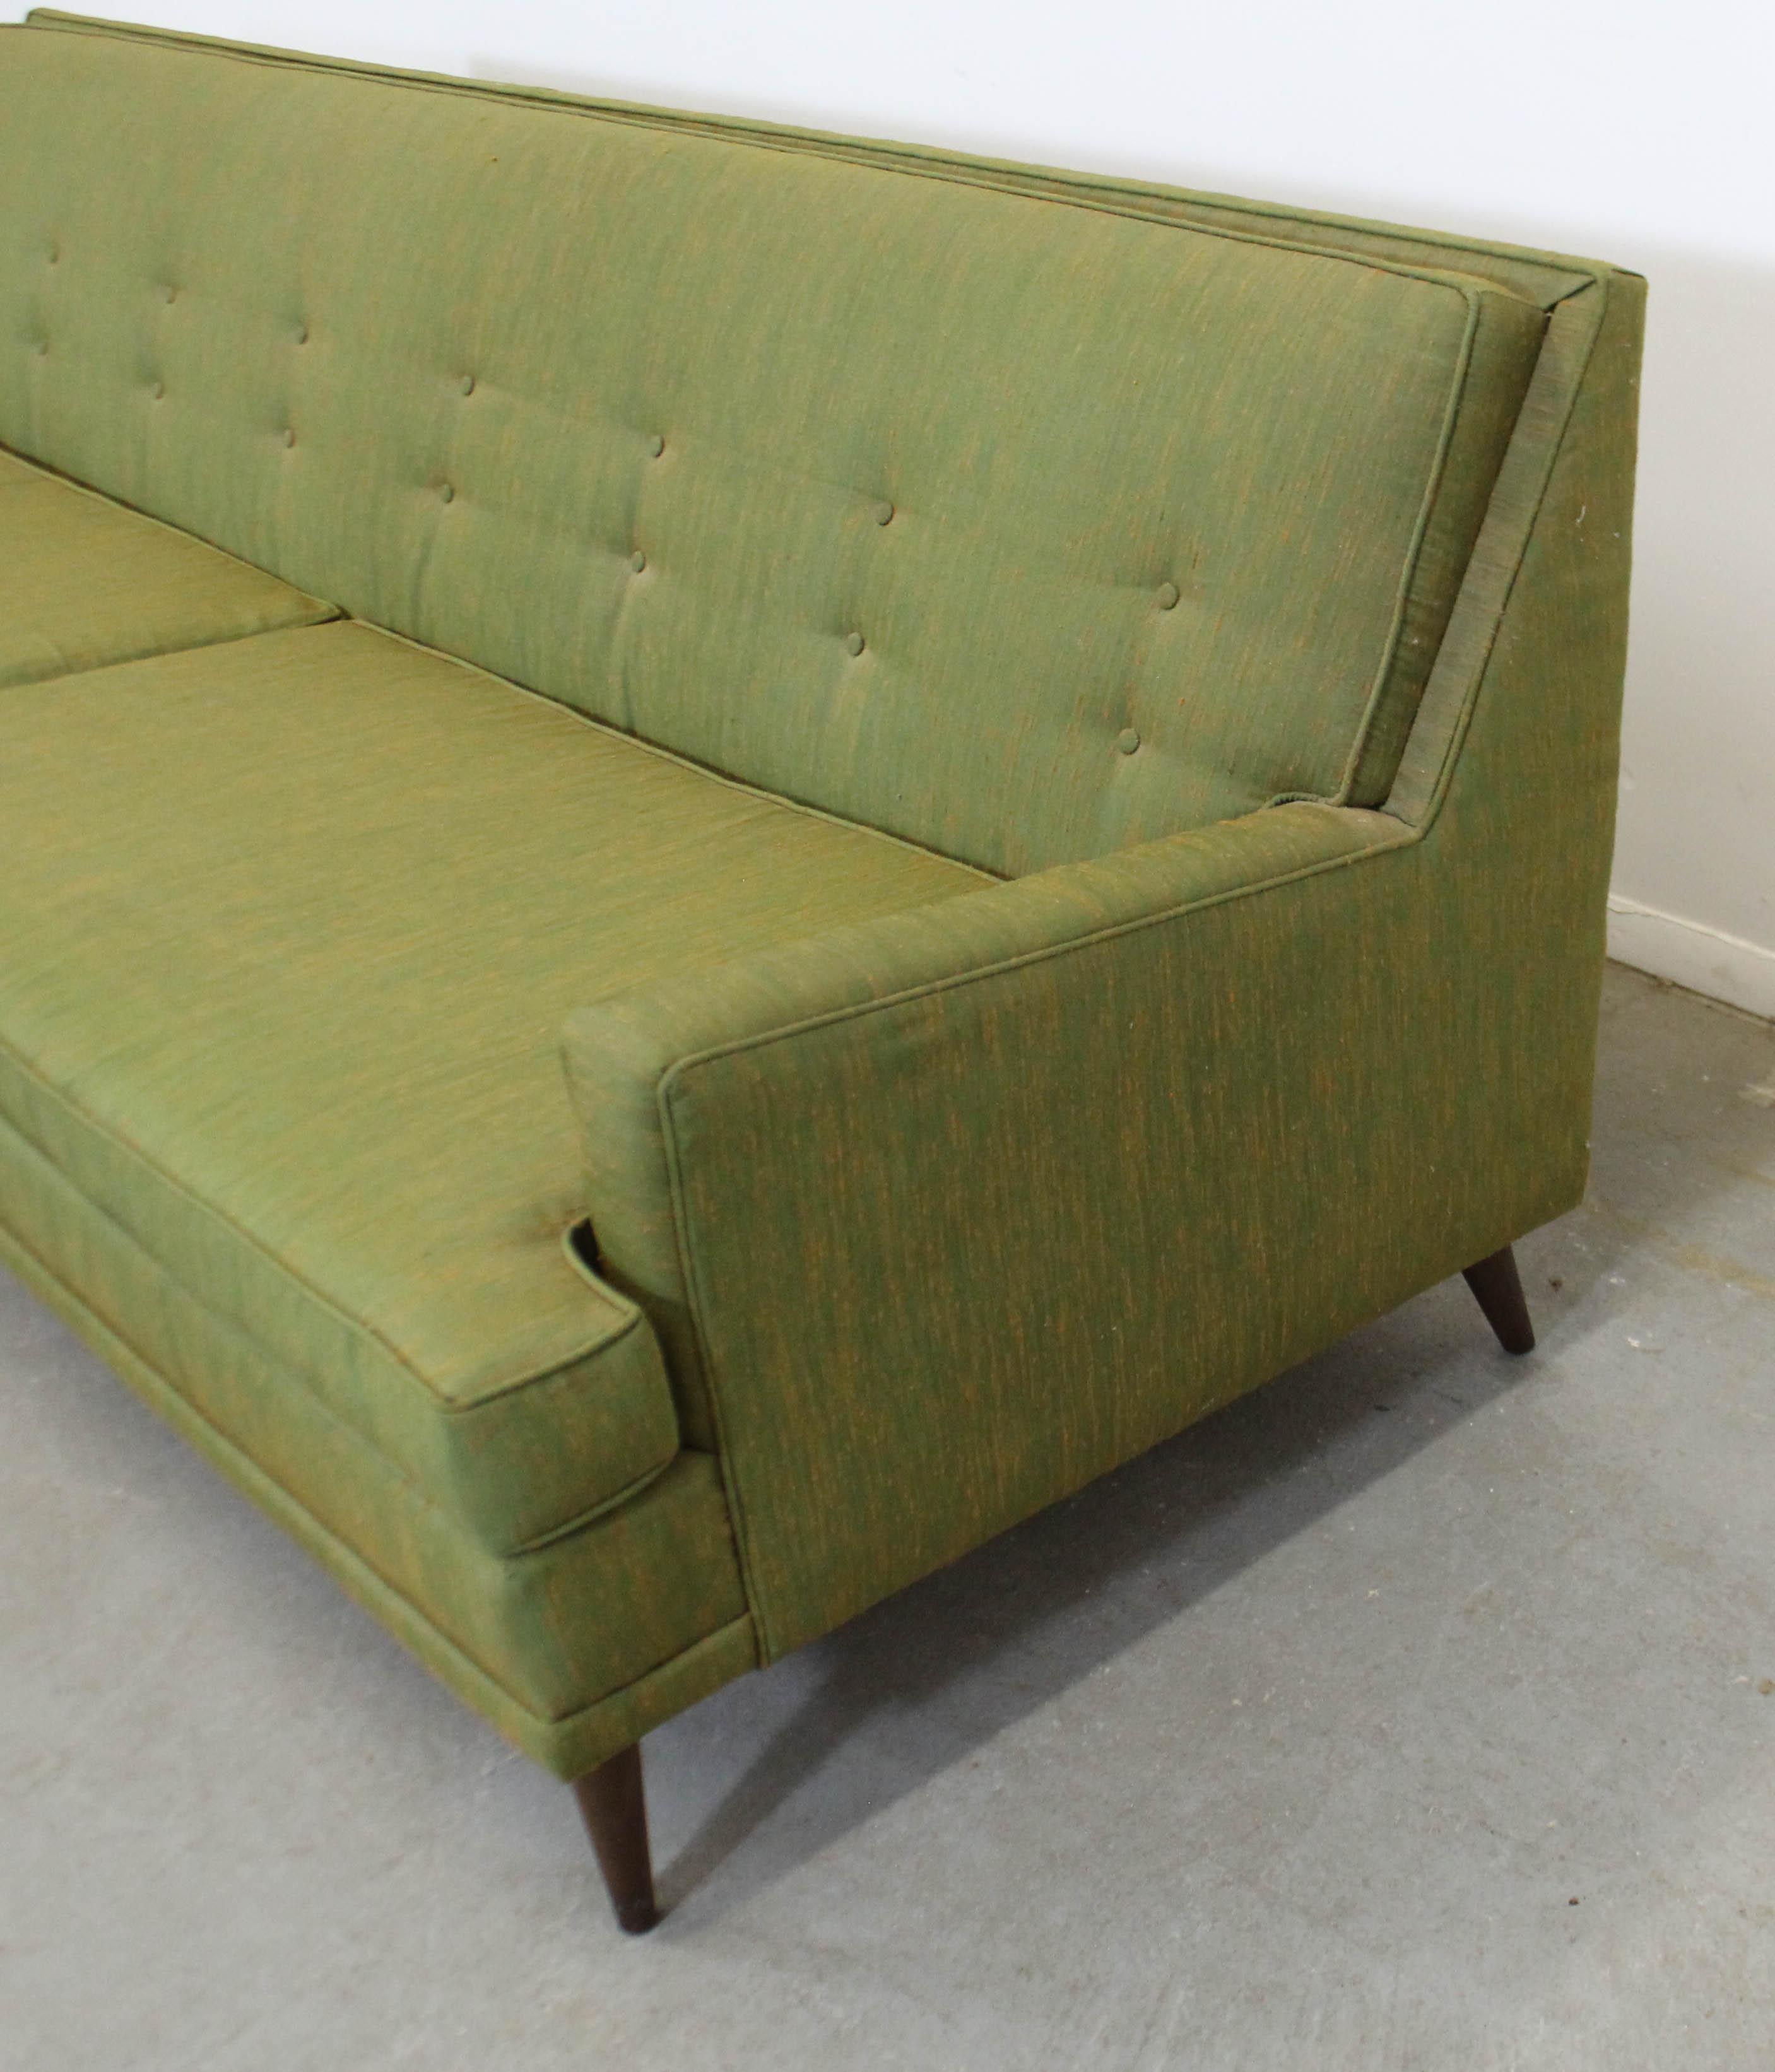 Pleasing Mid Century Modern Long Green Kroehler Sofa At 1Stdibs Creativecarmelina Interior Chair Design Creativecarmelinacom